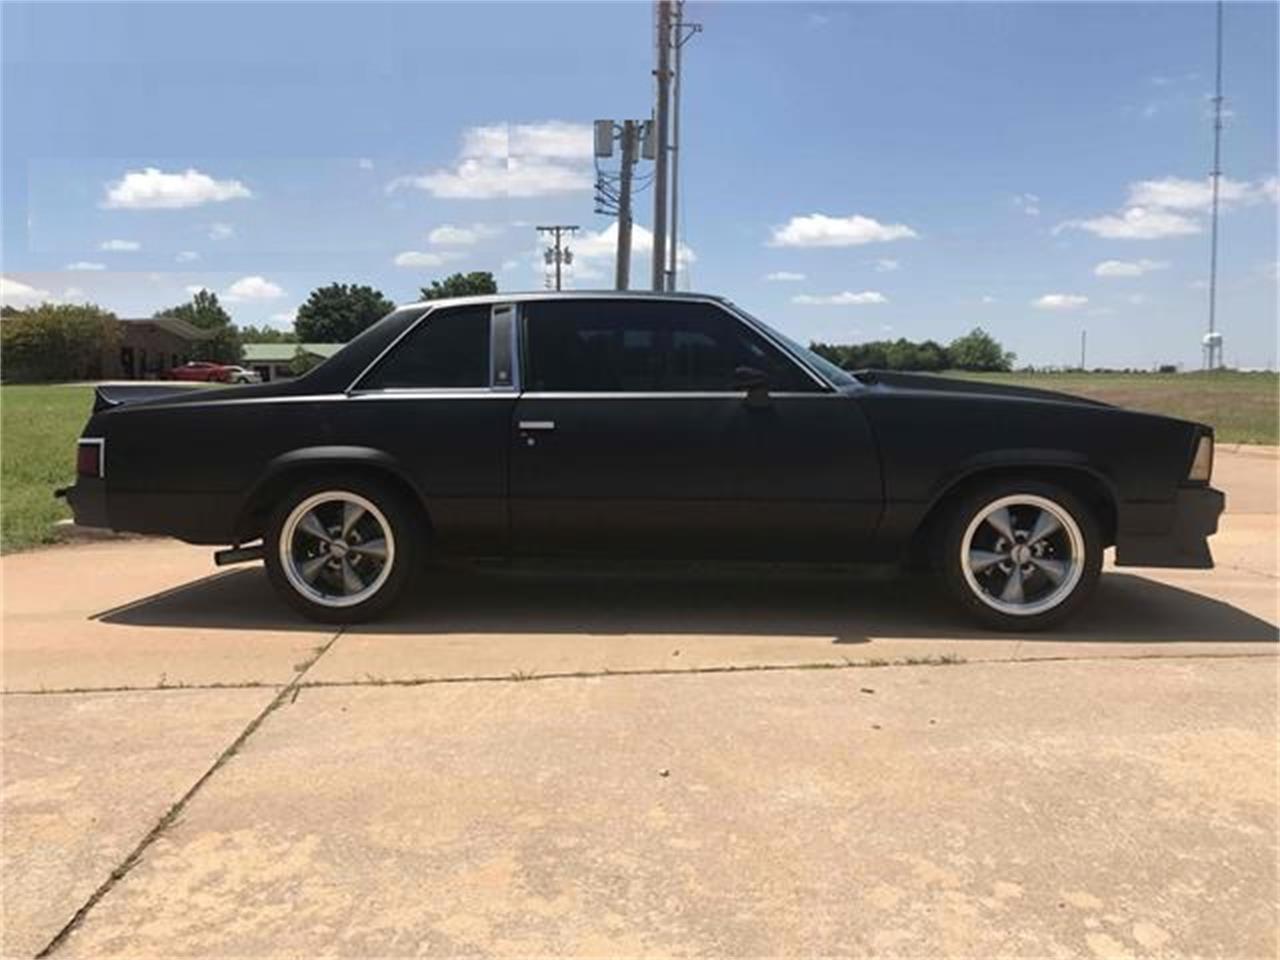 1981 Chevrolet Malibu (CC-1345031) for sale in Oklahoma city, Oklahoma